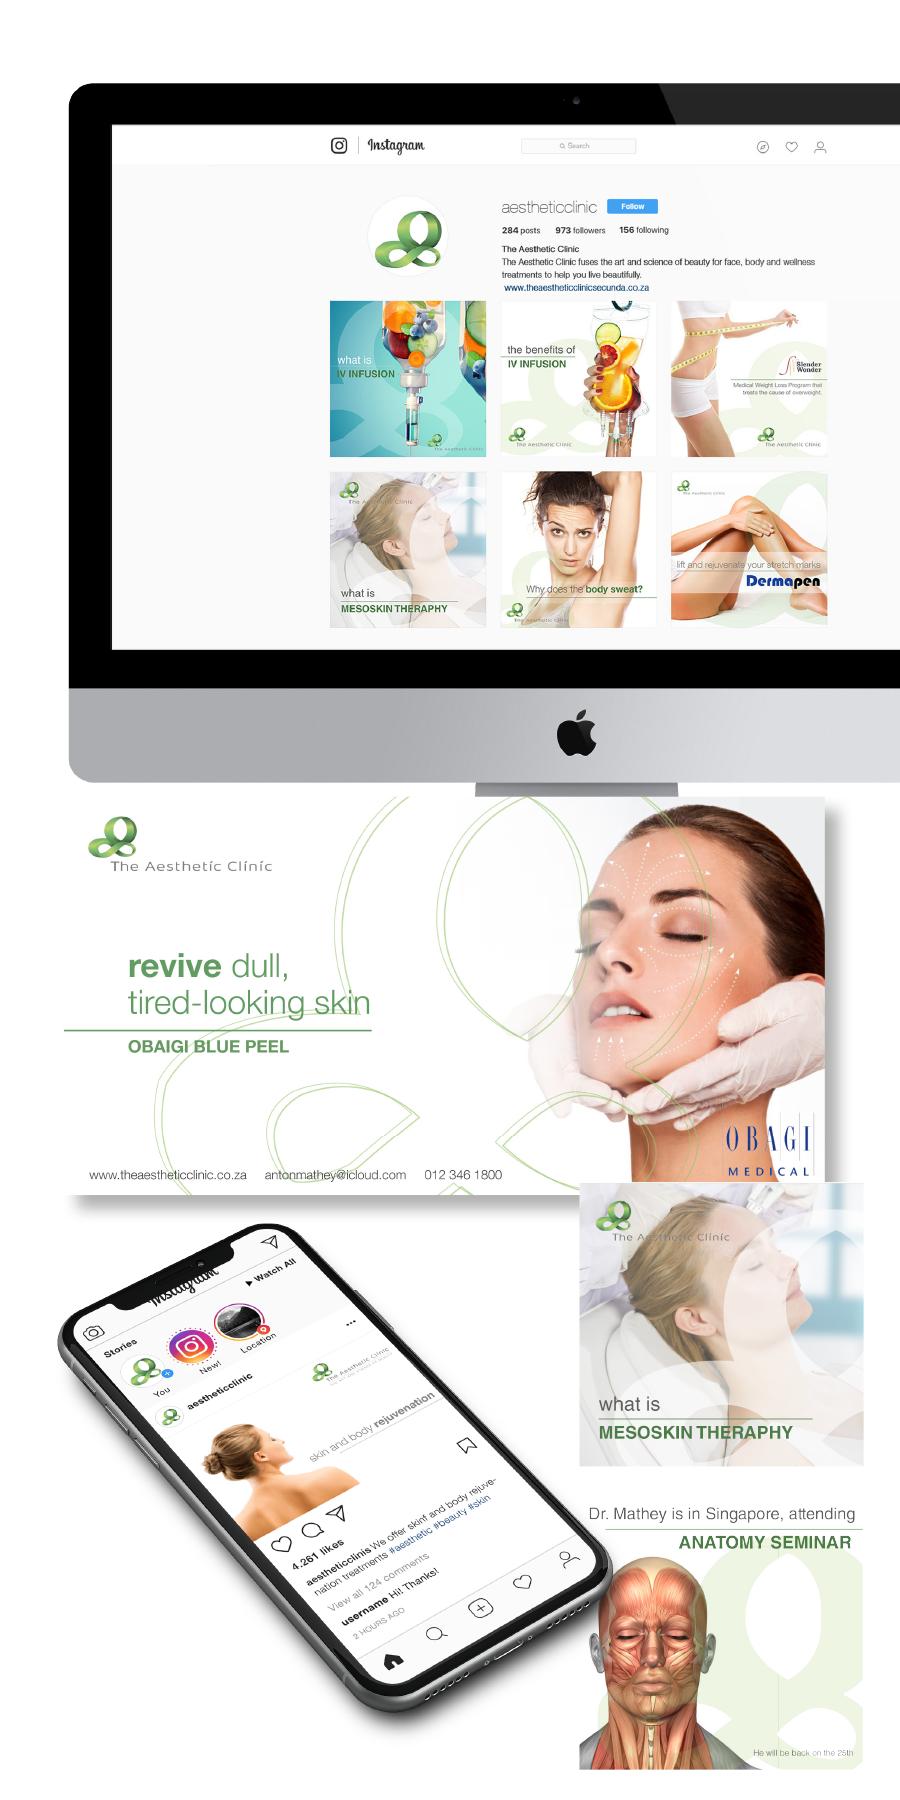 gazzaroo website design branding socialmediamanagement the aesthetic clinic social media - Social Media Management